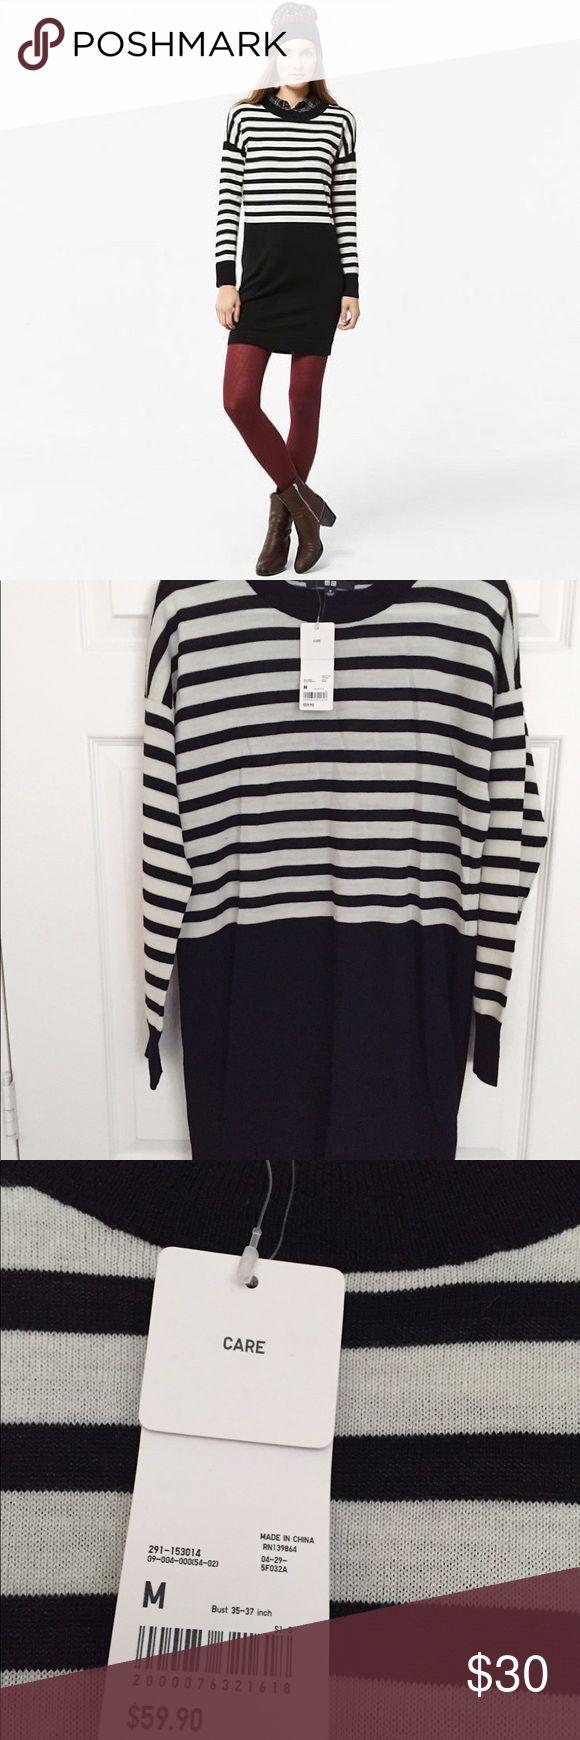 Uniqlo Merino blend striped long sleeve dress Brand new with tag Uniqlo knit long sleeve dress Price firm🕸  - bundle to save Uniqlo Dresses Long Sleeve